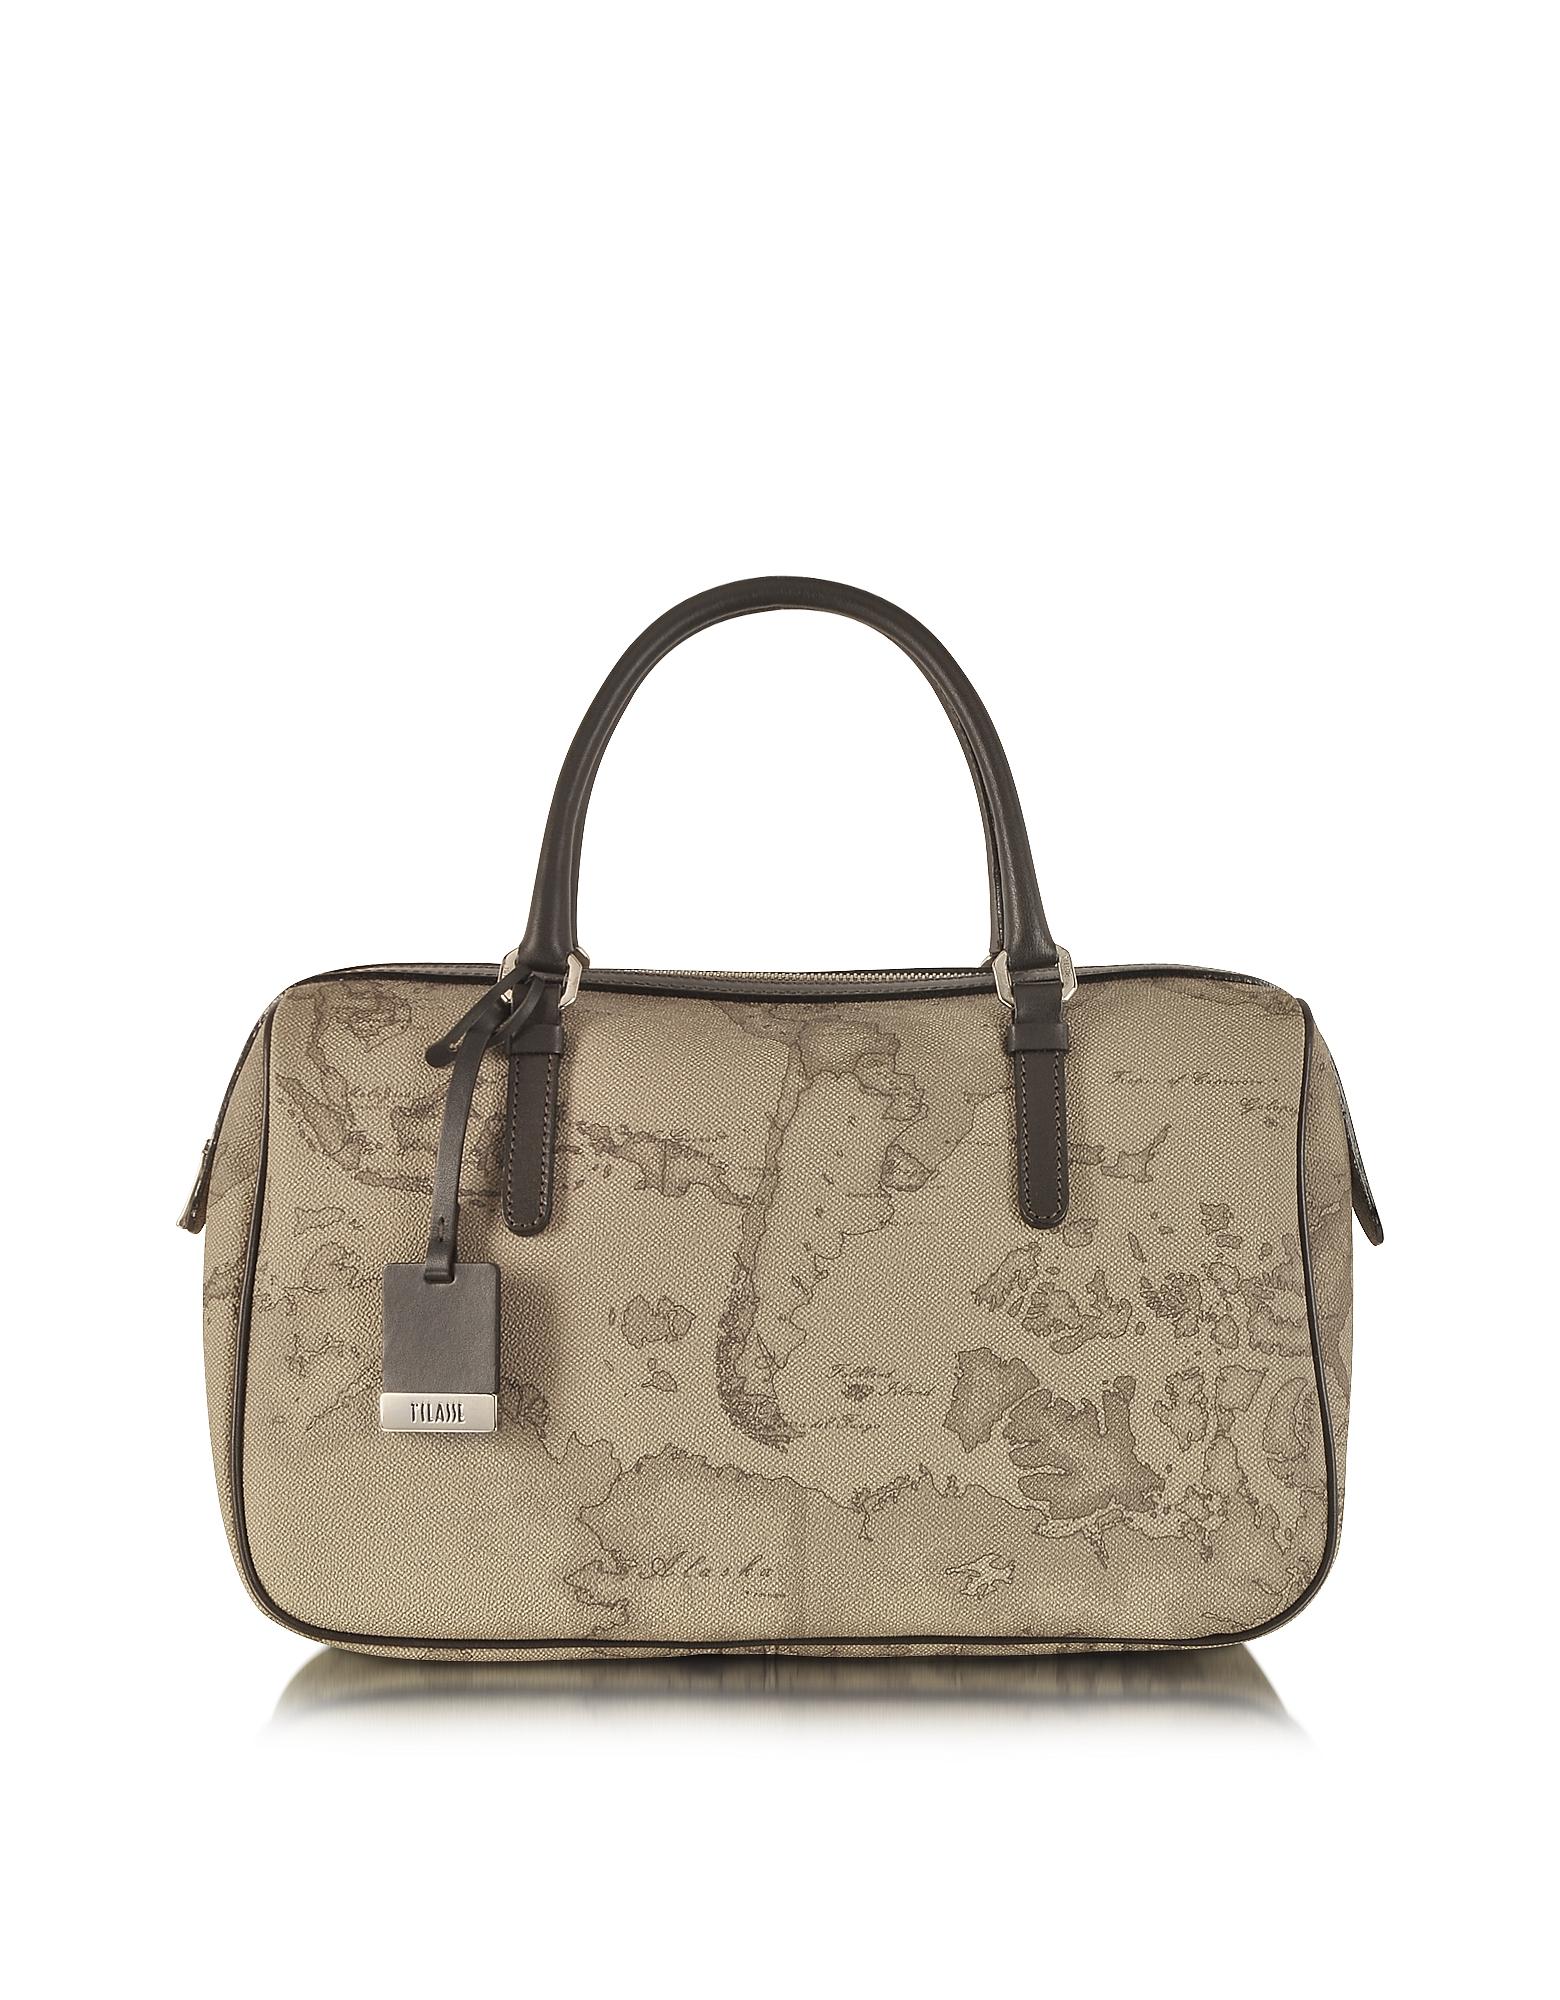 1a Prima Classe - Geo Printed Medium 'New Basic' Satchel Bag